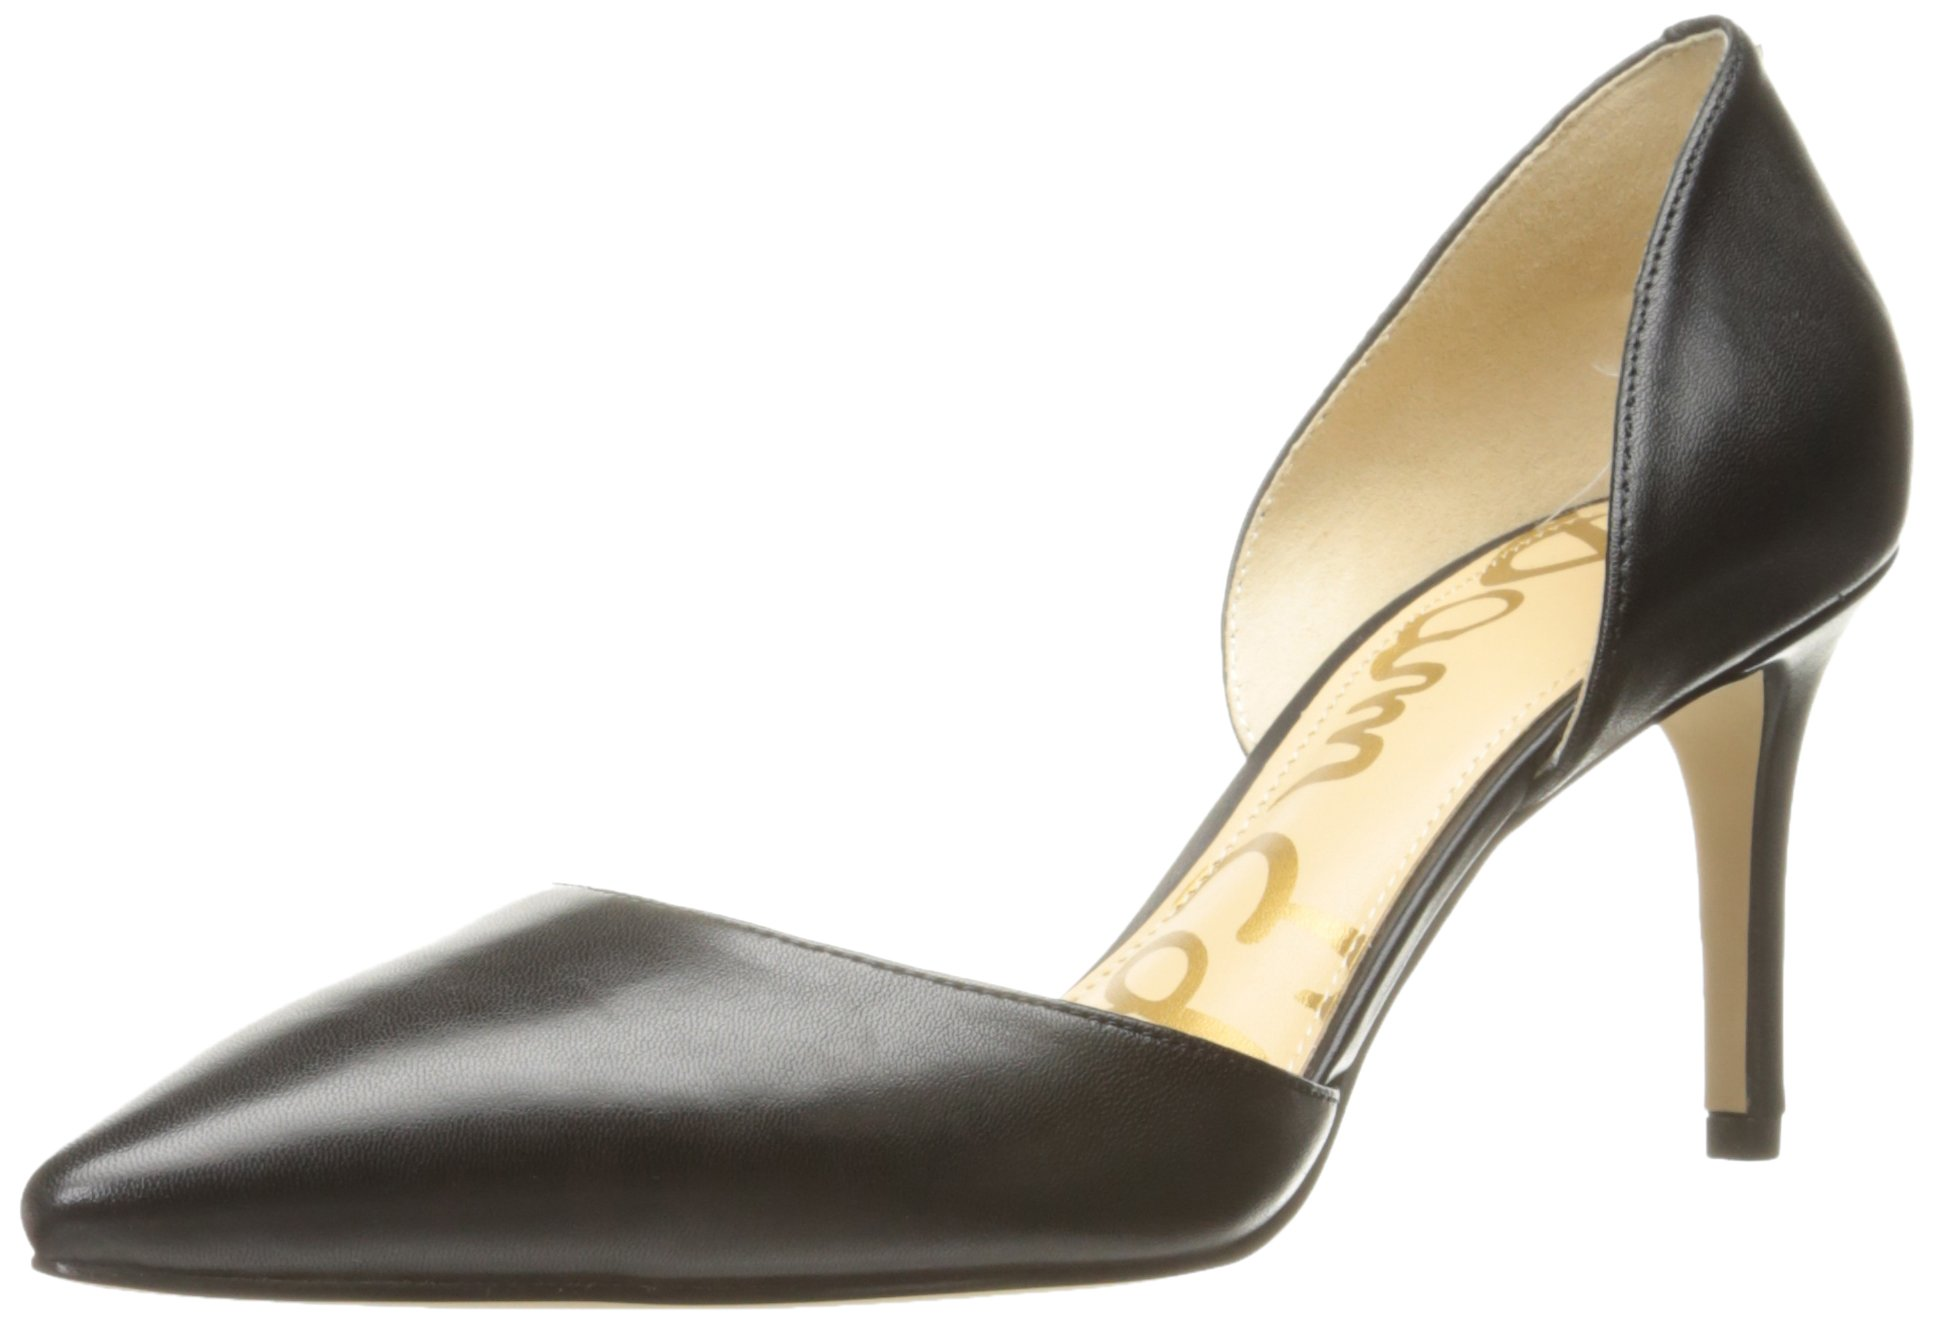 Sam Edelman Women's Telsa Pump, Black Leather, 8.5 M US